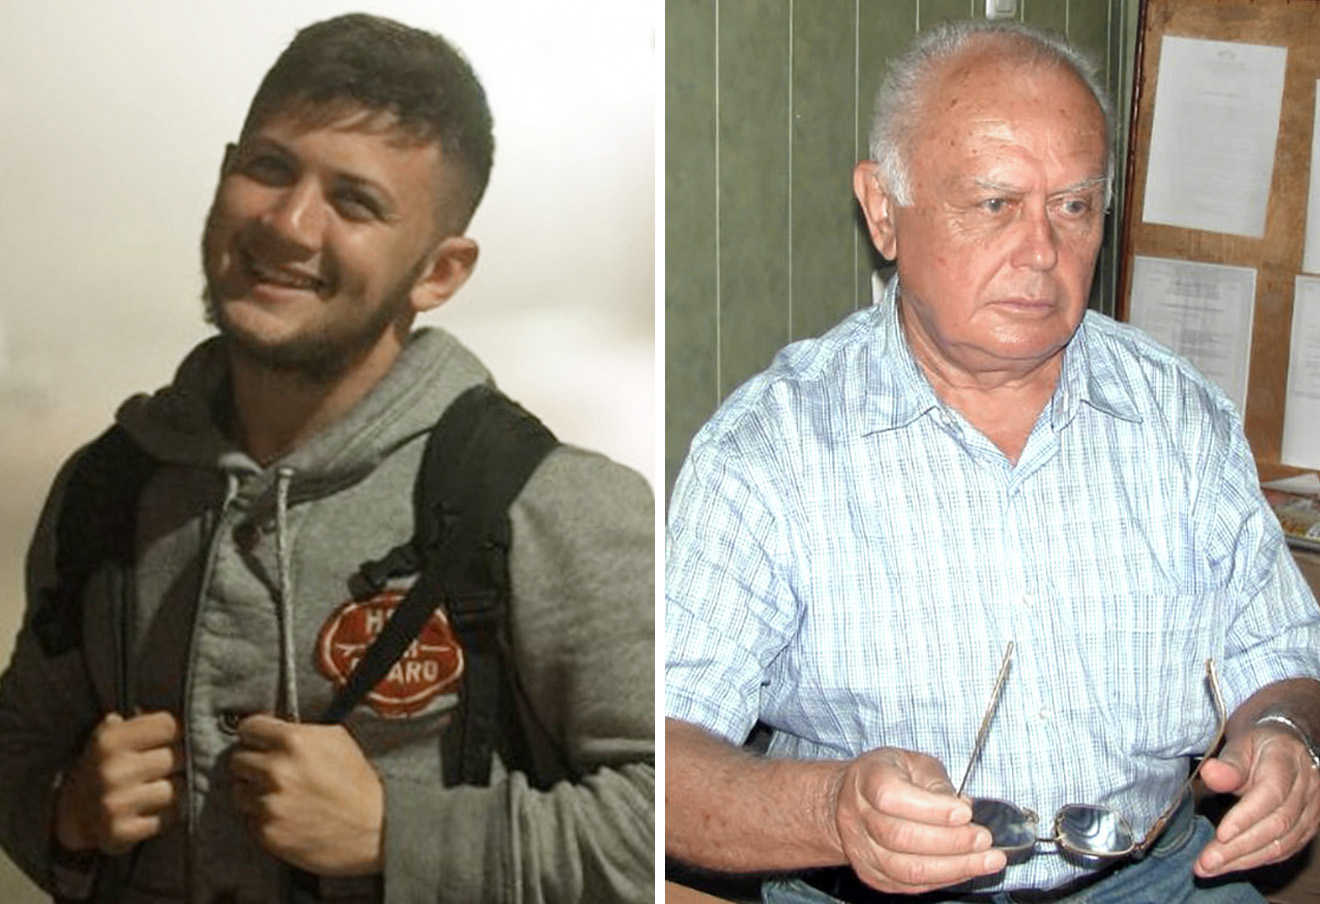 Геннадий Афанасьев и Юрий Солошенко